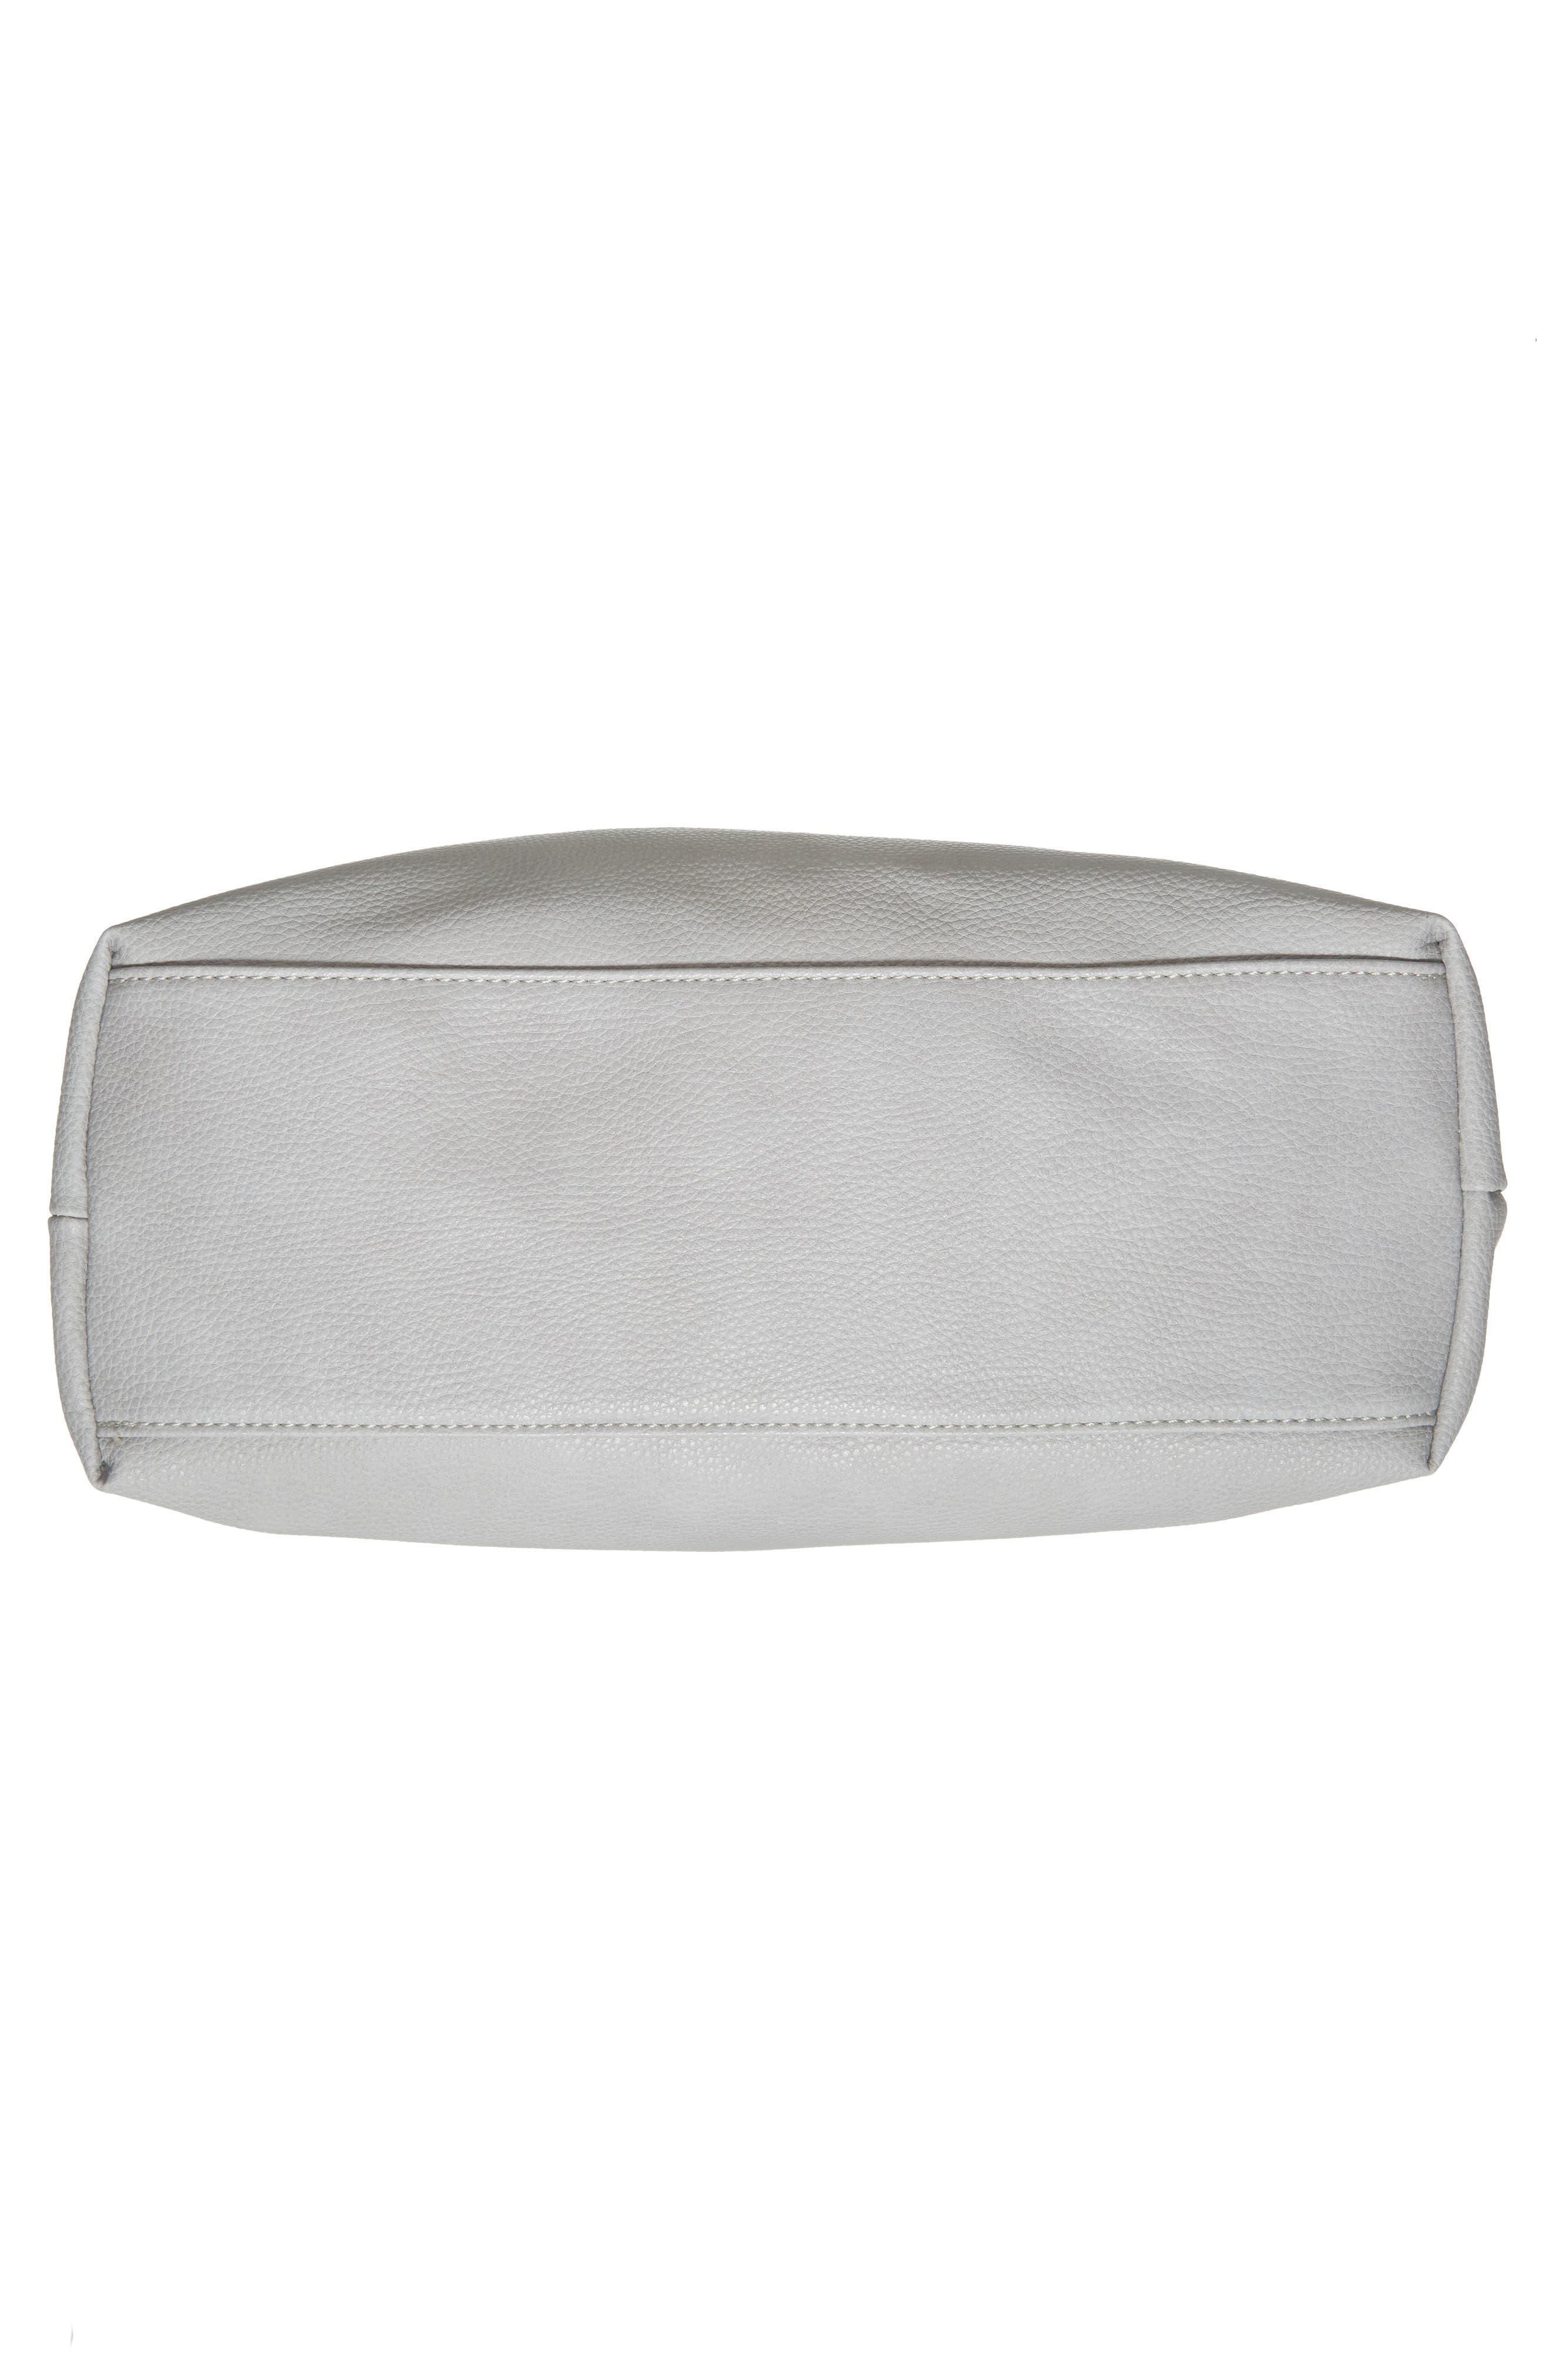 Taylor Faux Leather Shoulder Bag,                             Alternate thumbnail 17, color,